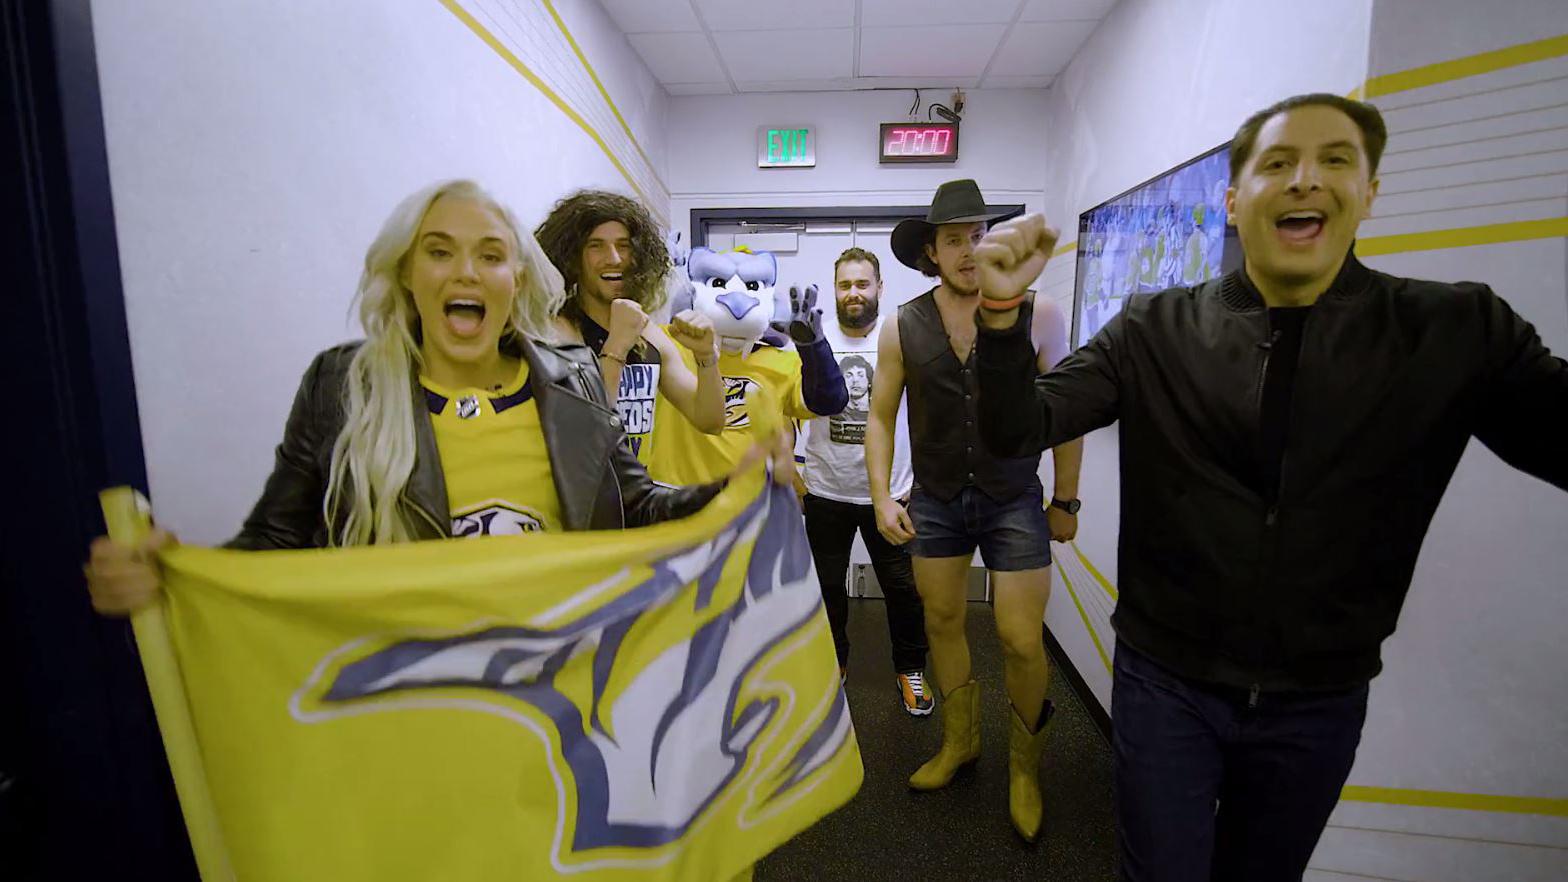 WWE's Rusev, Lana bring Predators' Ryan Johansen, Roman Josi into wrestling